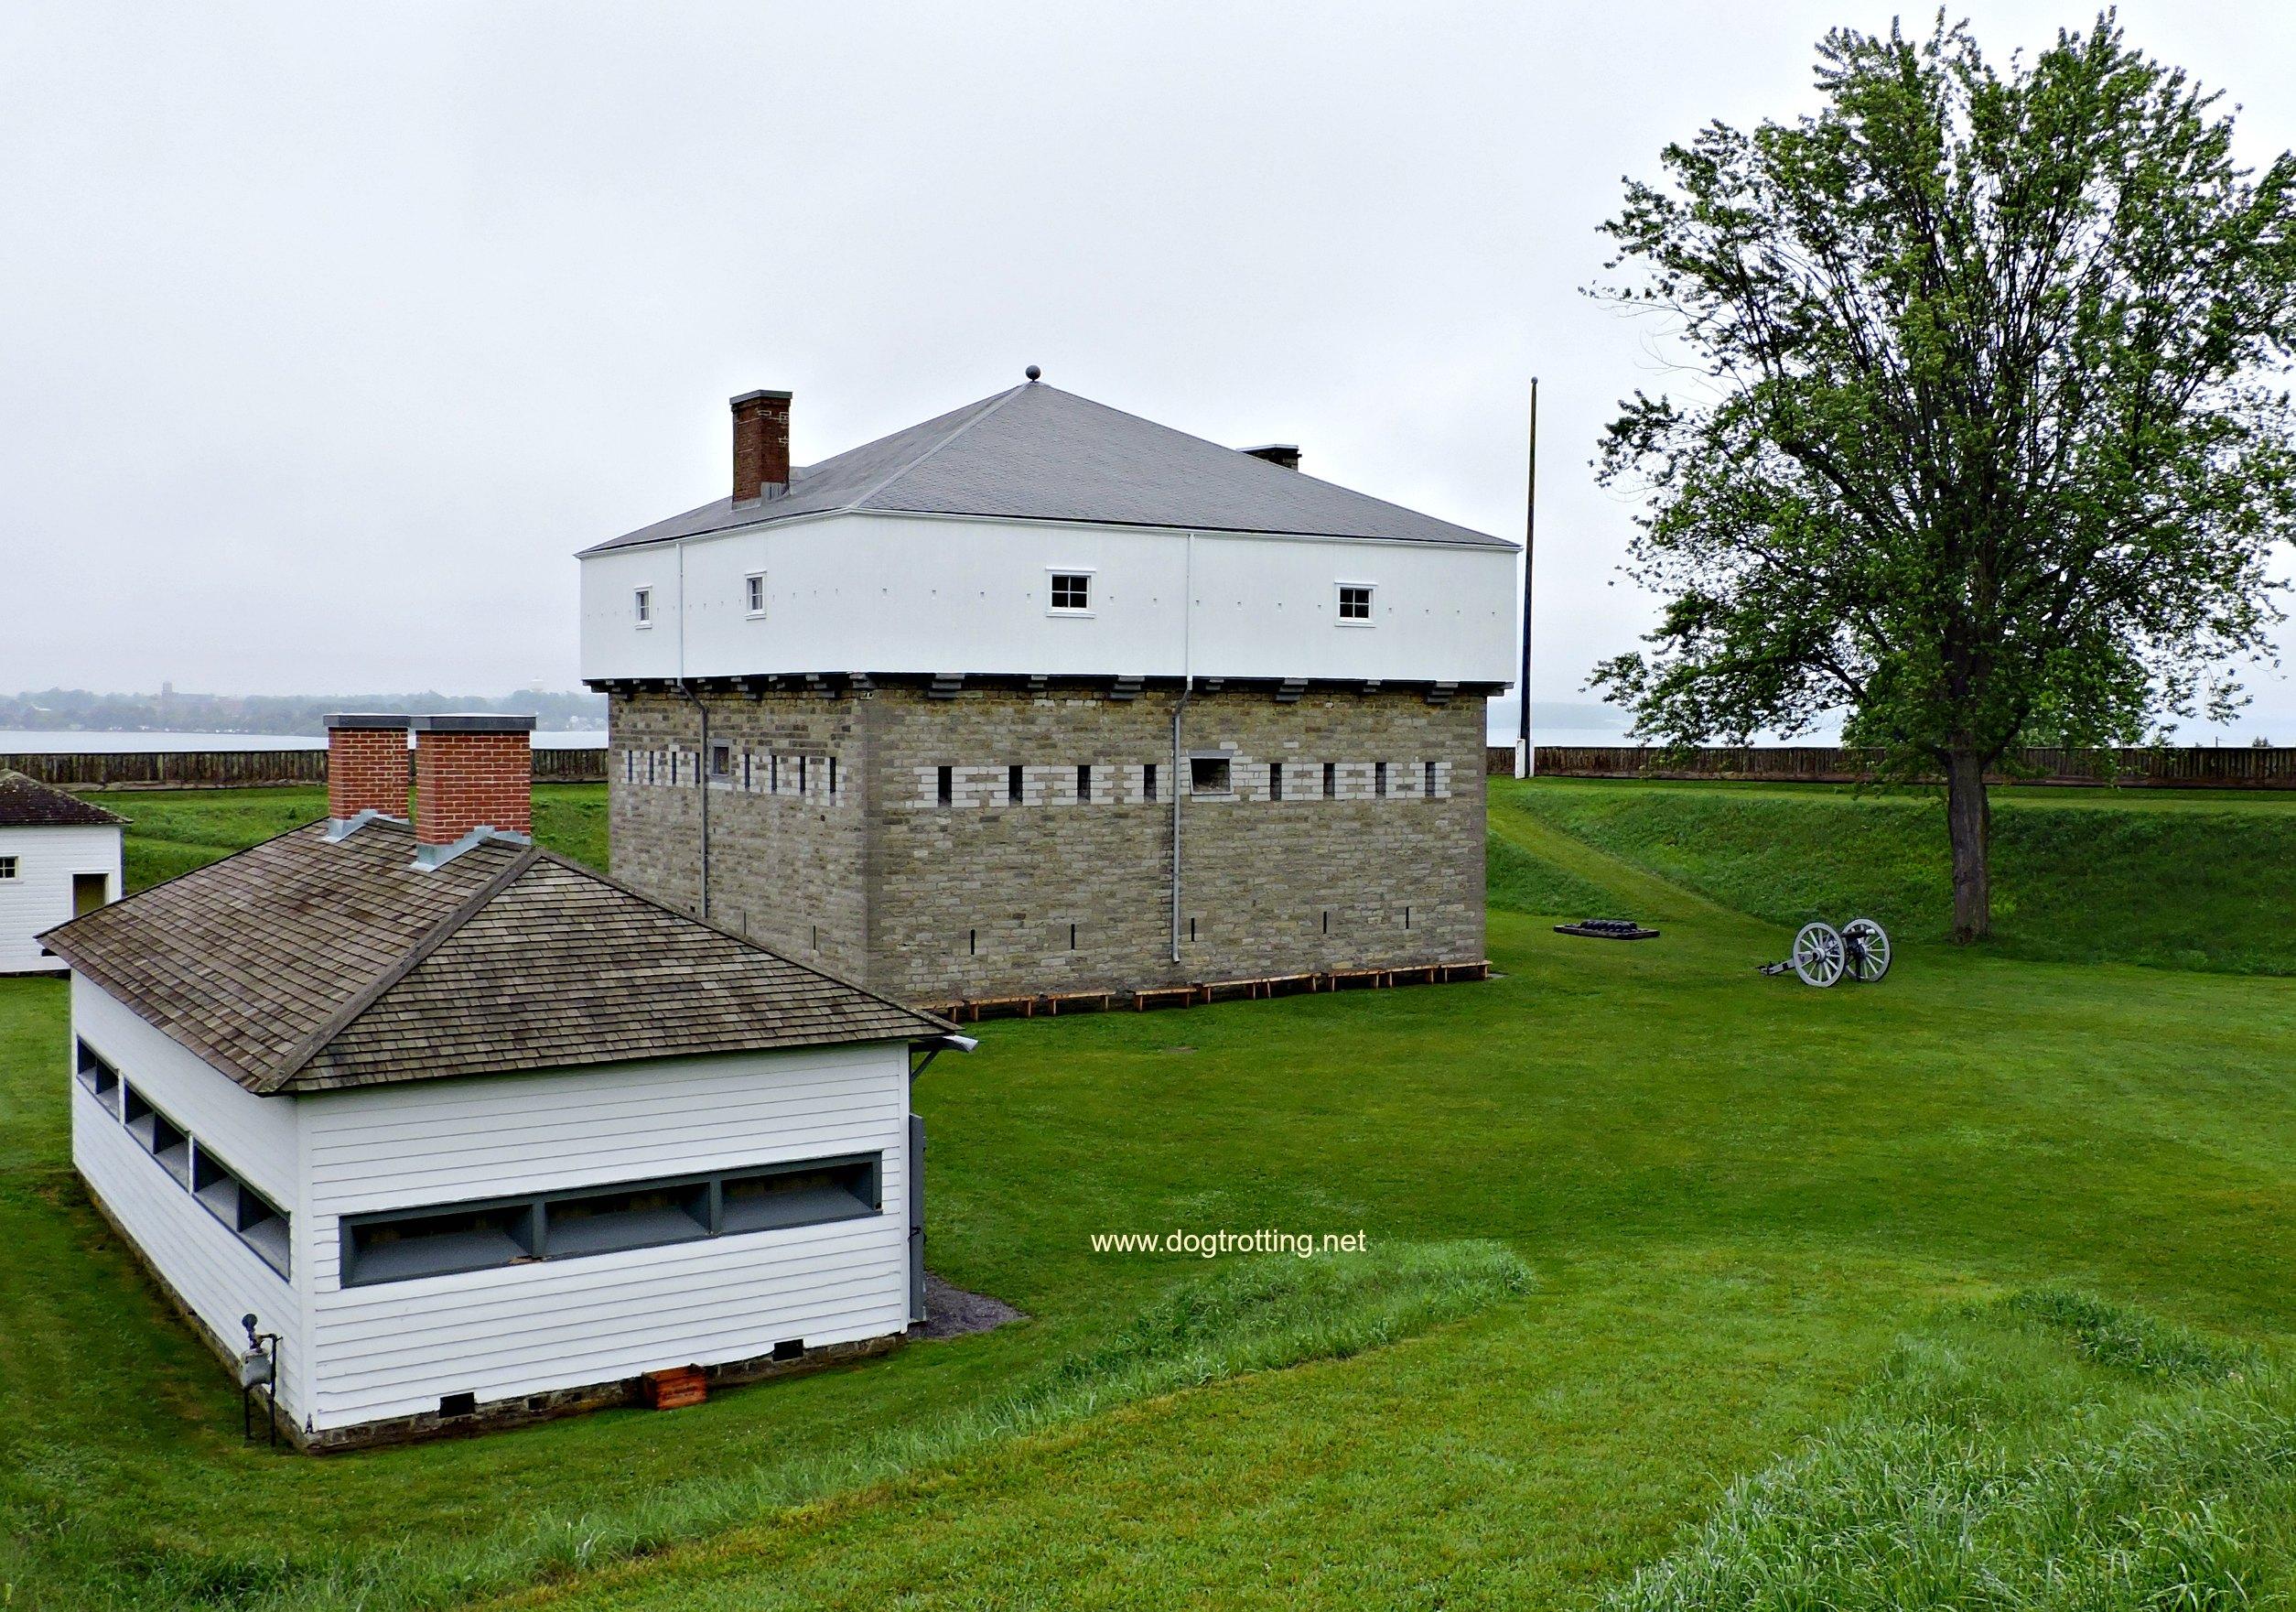 Barracks at dog-friendly Fort Wellington, Prescott, Ontario